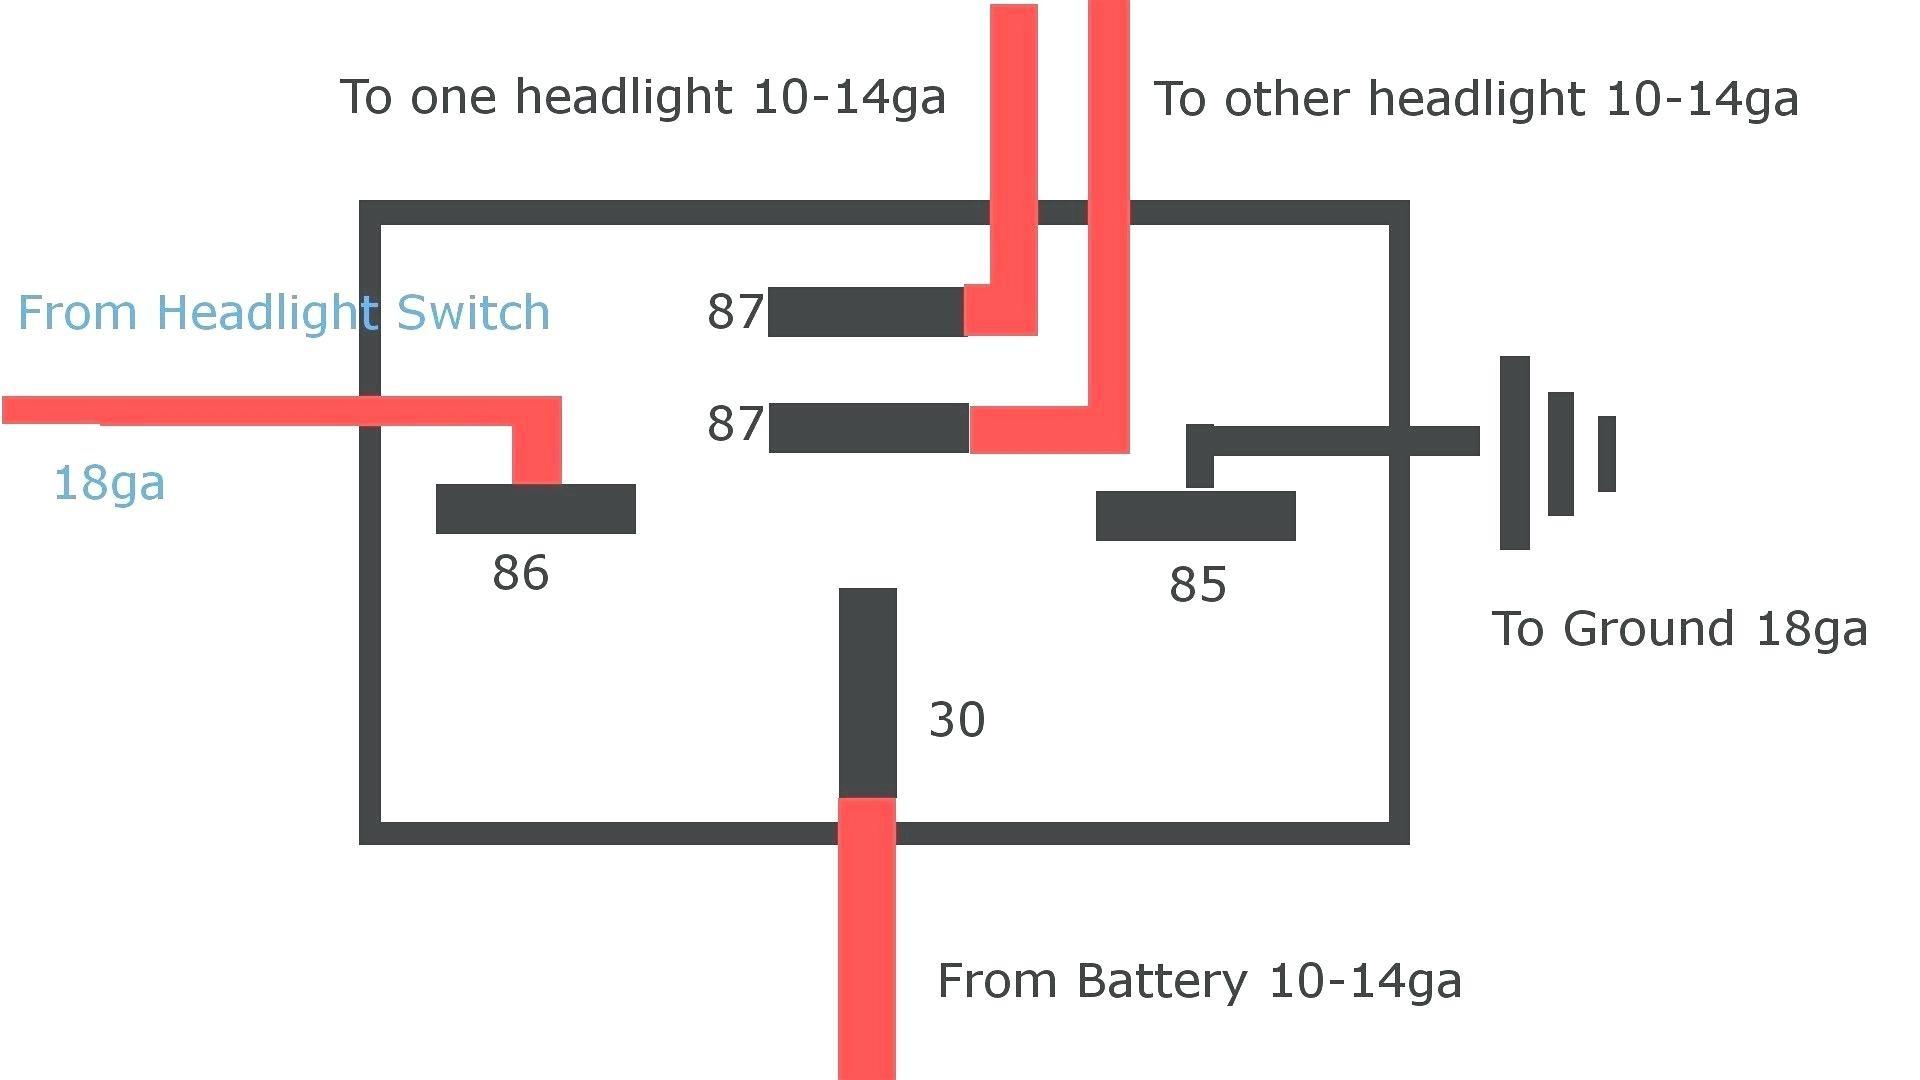 Dixie Air Horn Wiring Diagram | Wiring Liry on air horn cover, horn circuit diagram, air horn solenoid, truck air horn diagram, air horn parts diagram, horn relay diagram, air horn power supply, air horn schematic diagram, international air horn diagram, air horn switch, air horn compressor, fiamm air horn diagram,